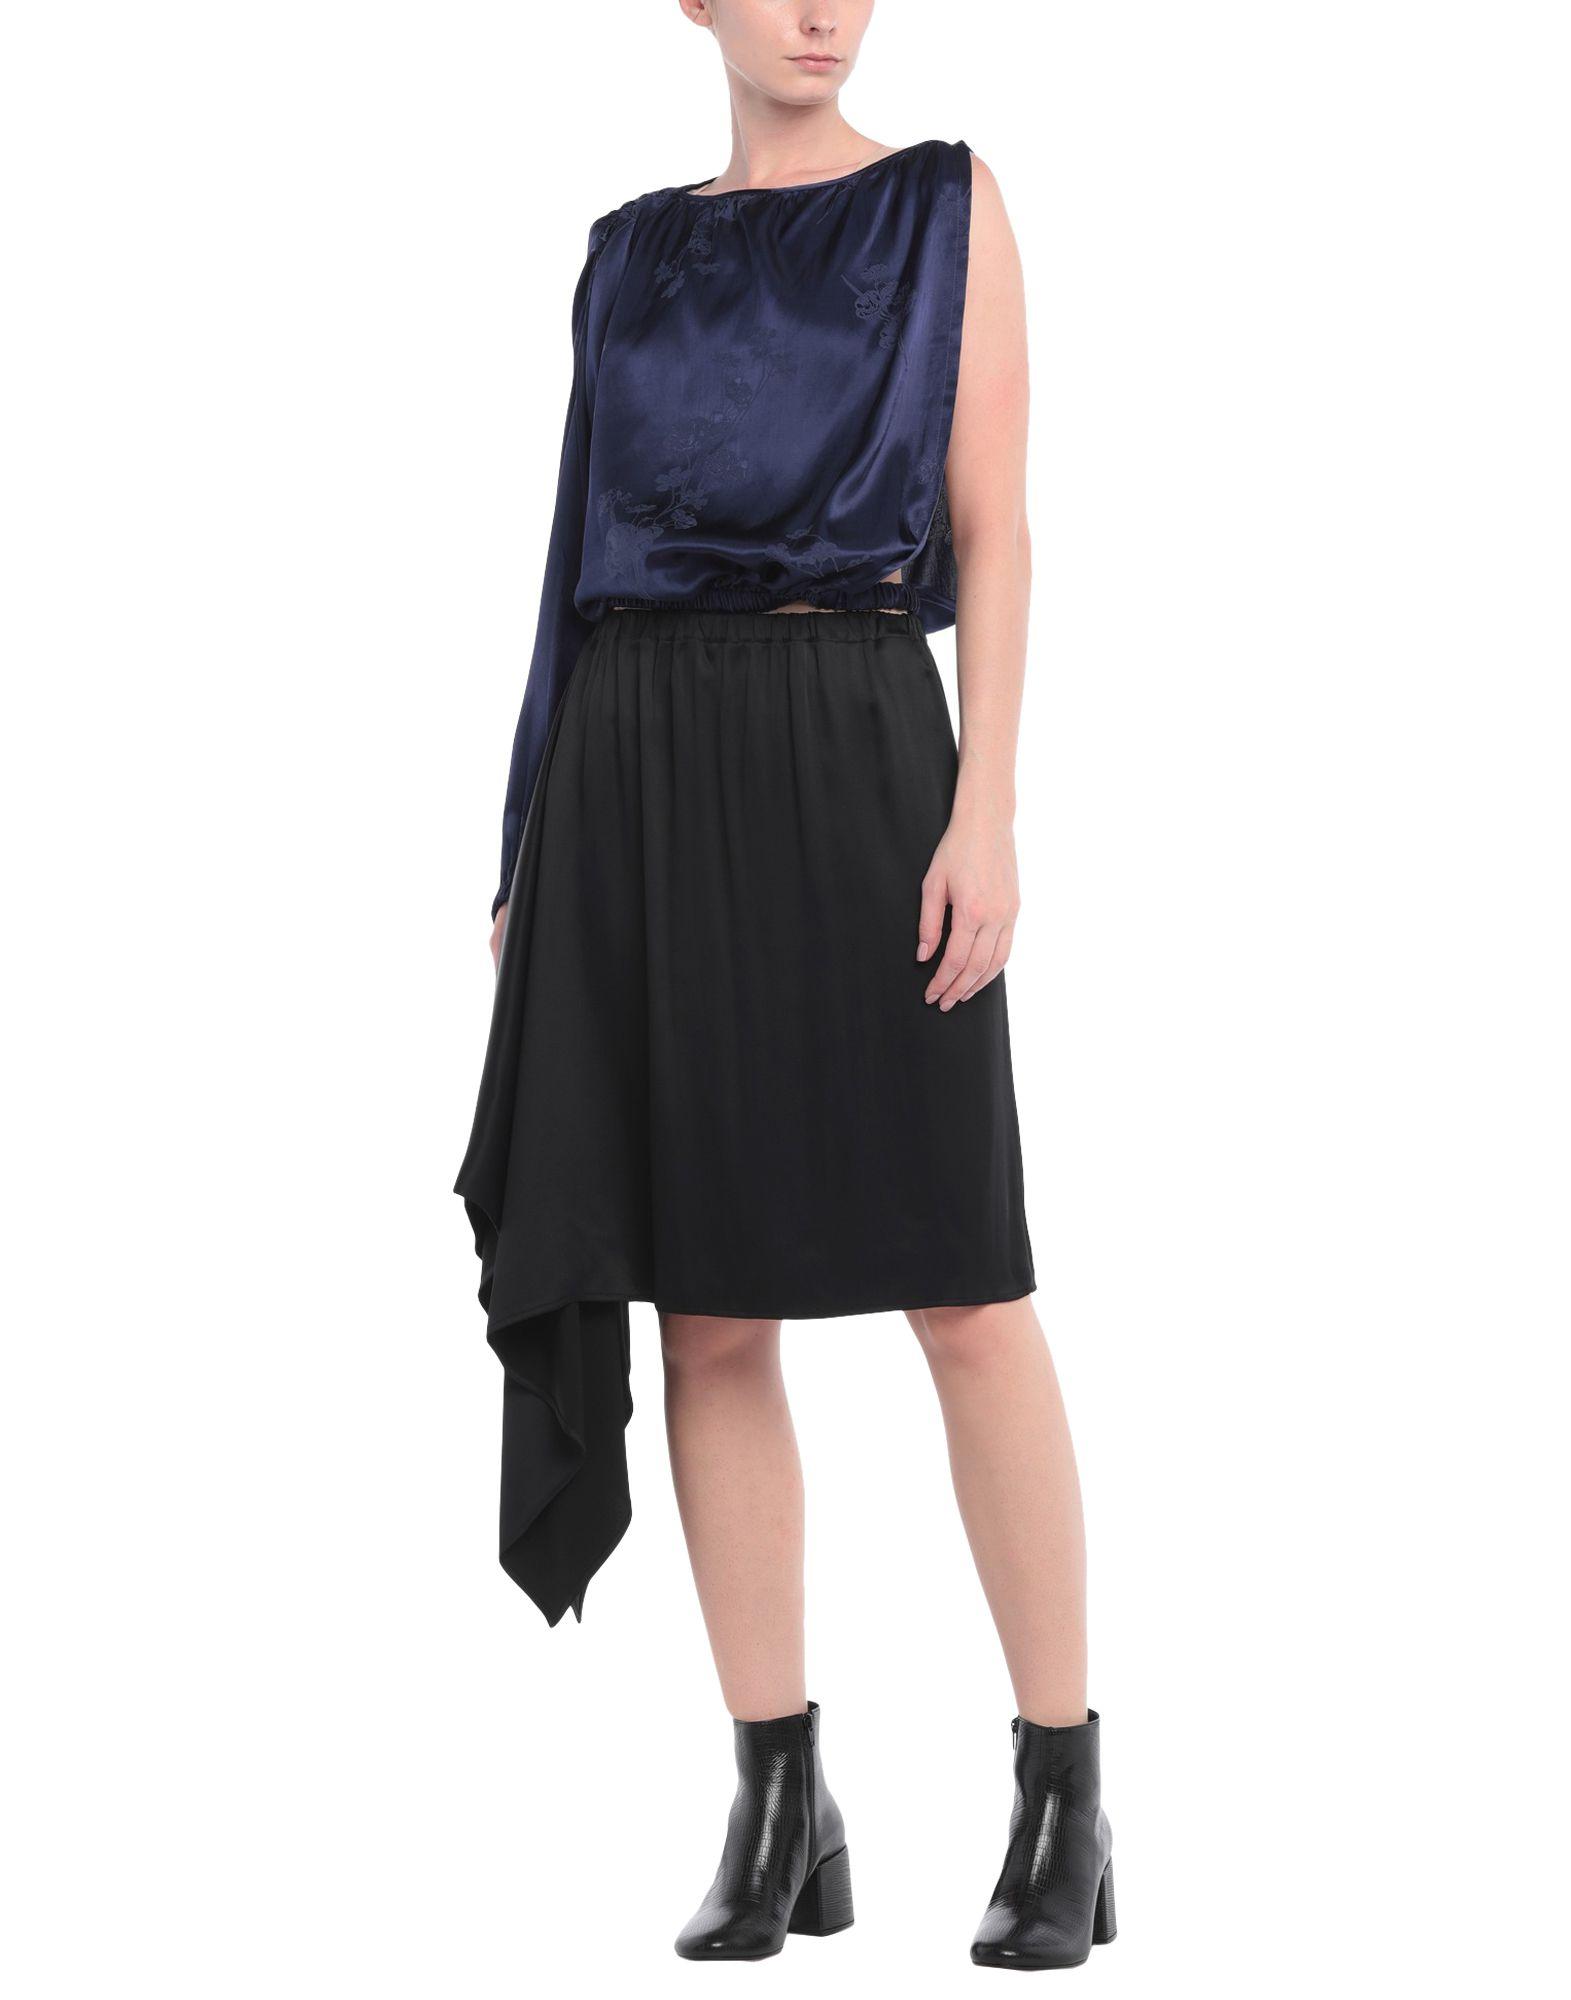 MM6 MAISON MARGIELA Sets. crepe, satin, no appliqués, two-tone, no pockets, wide neckline, sleeveless, 3-piece set, single-breasted, unlined. 100% Viscose, Cotton, Polyamide, Elastane